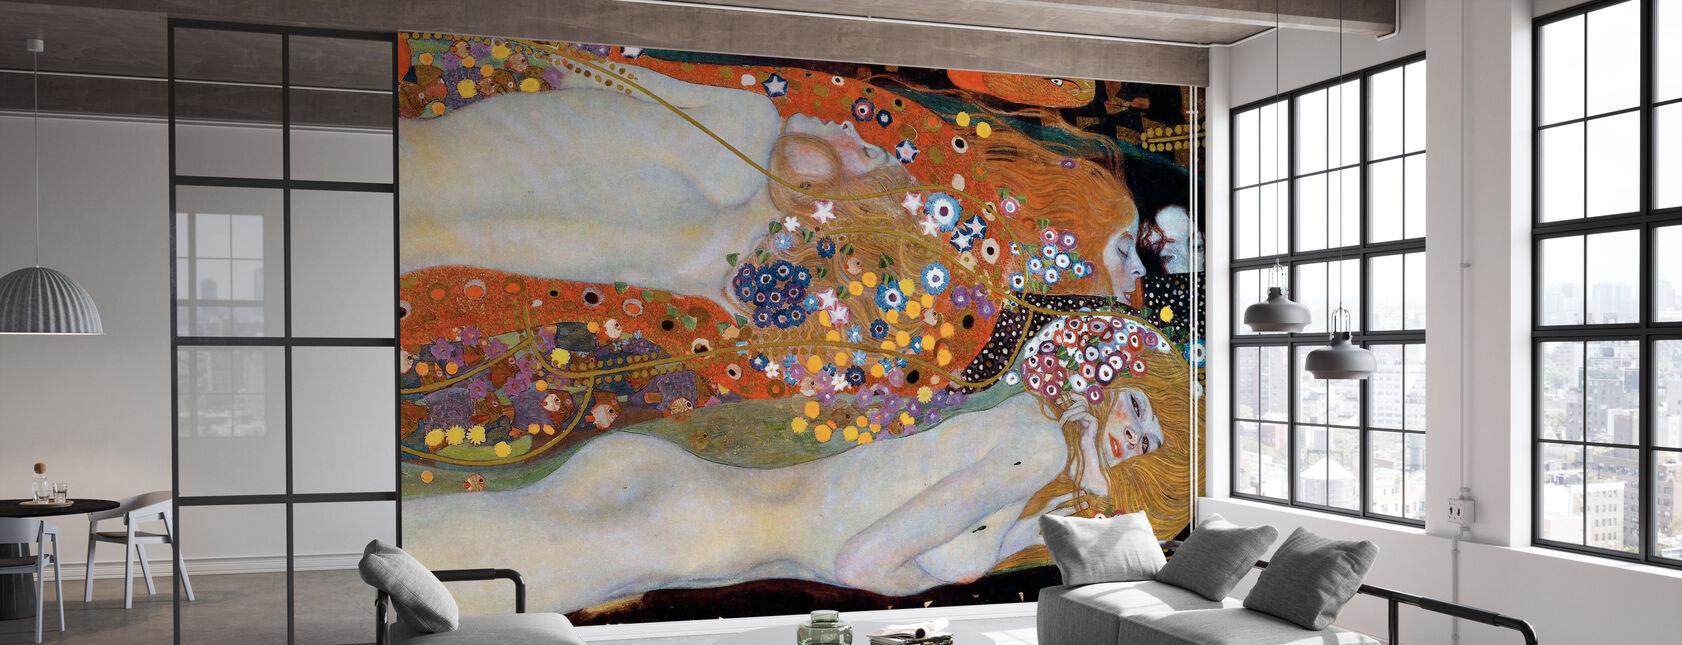 Water Serpents - Gustav Klimt - Wallpaper - Office